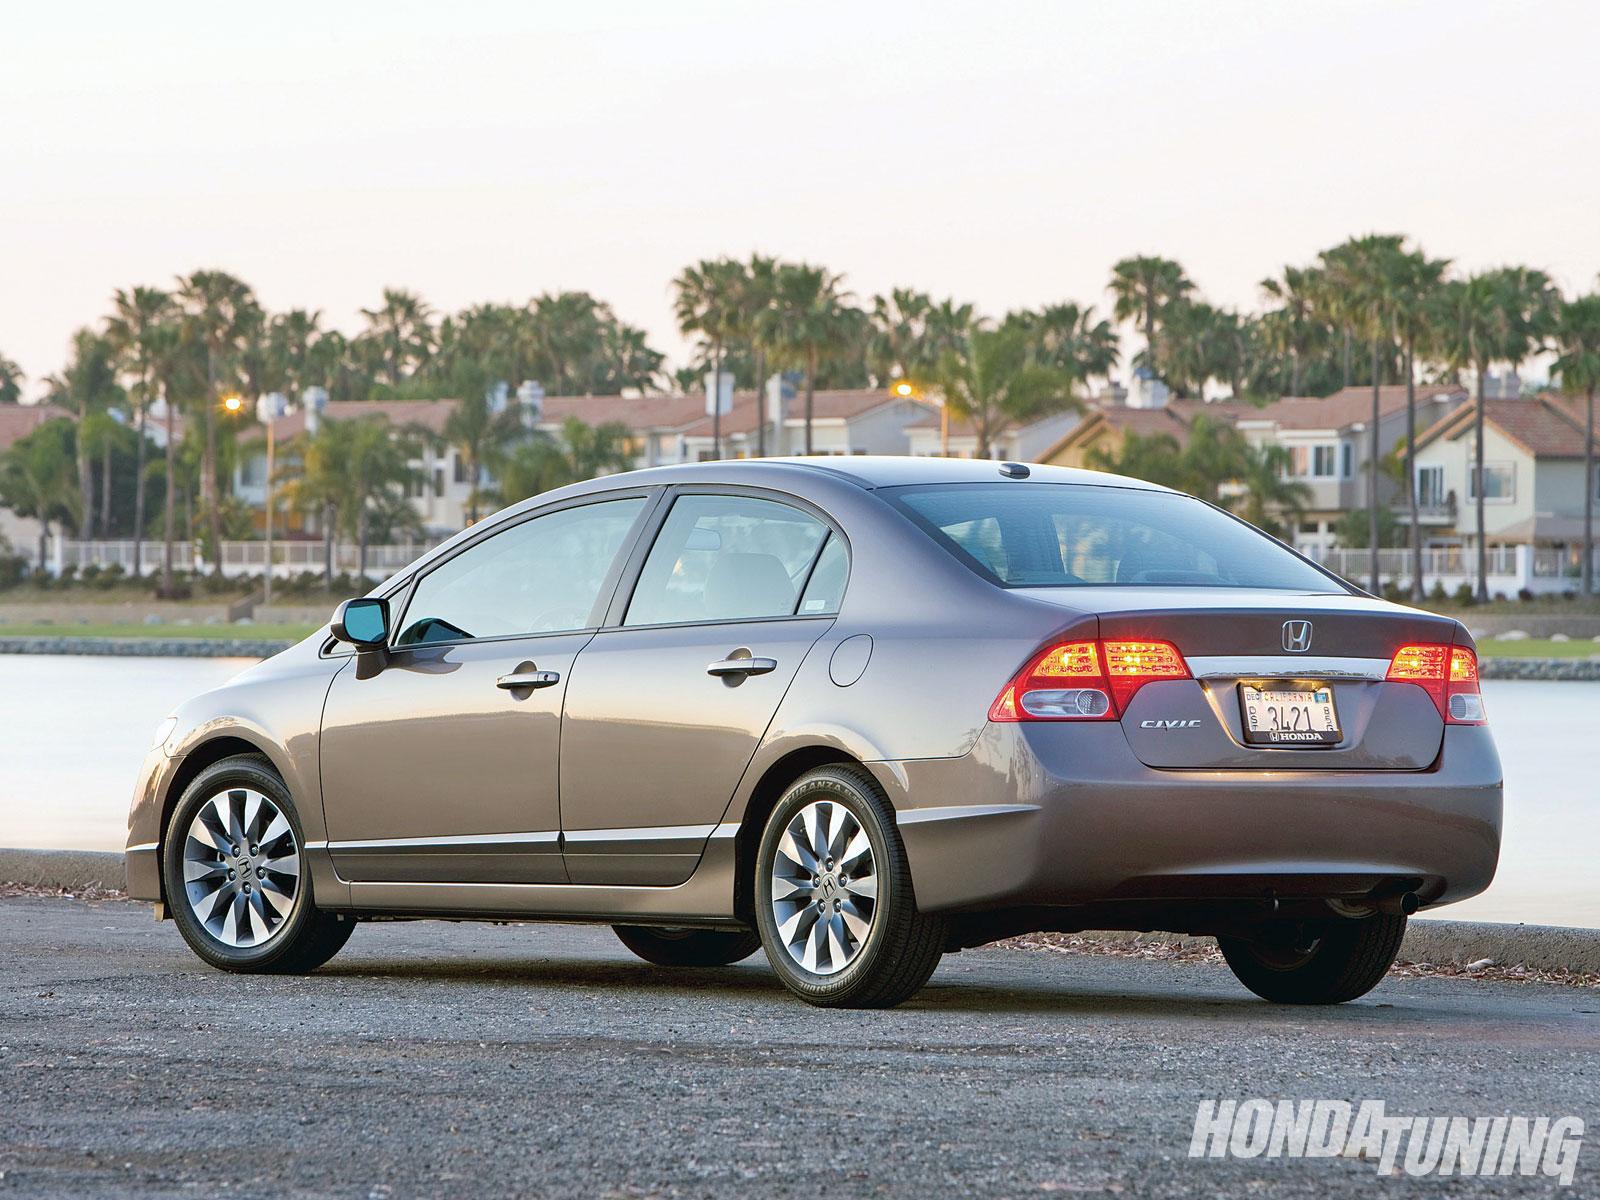 2006 Honda Civic Ex Boosting The R18 Honda Tuning Magazine